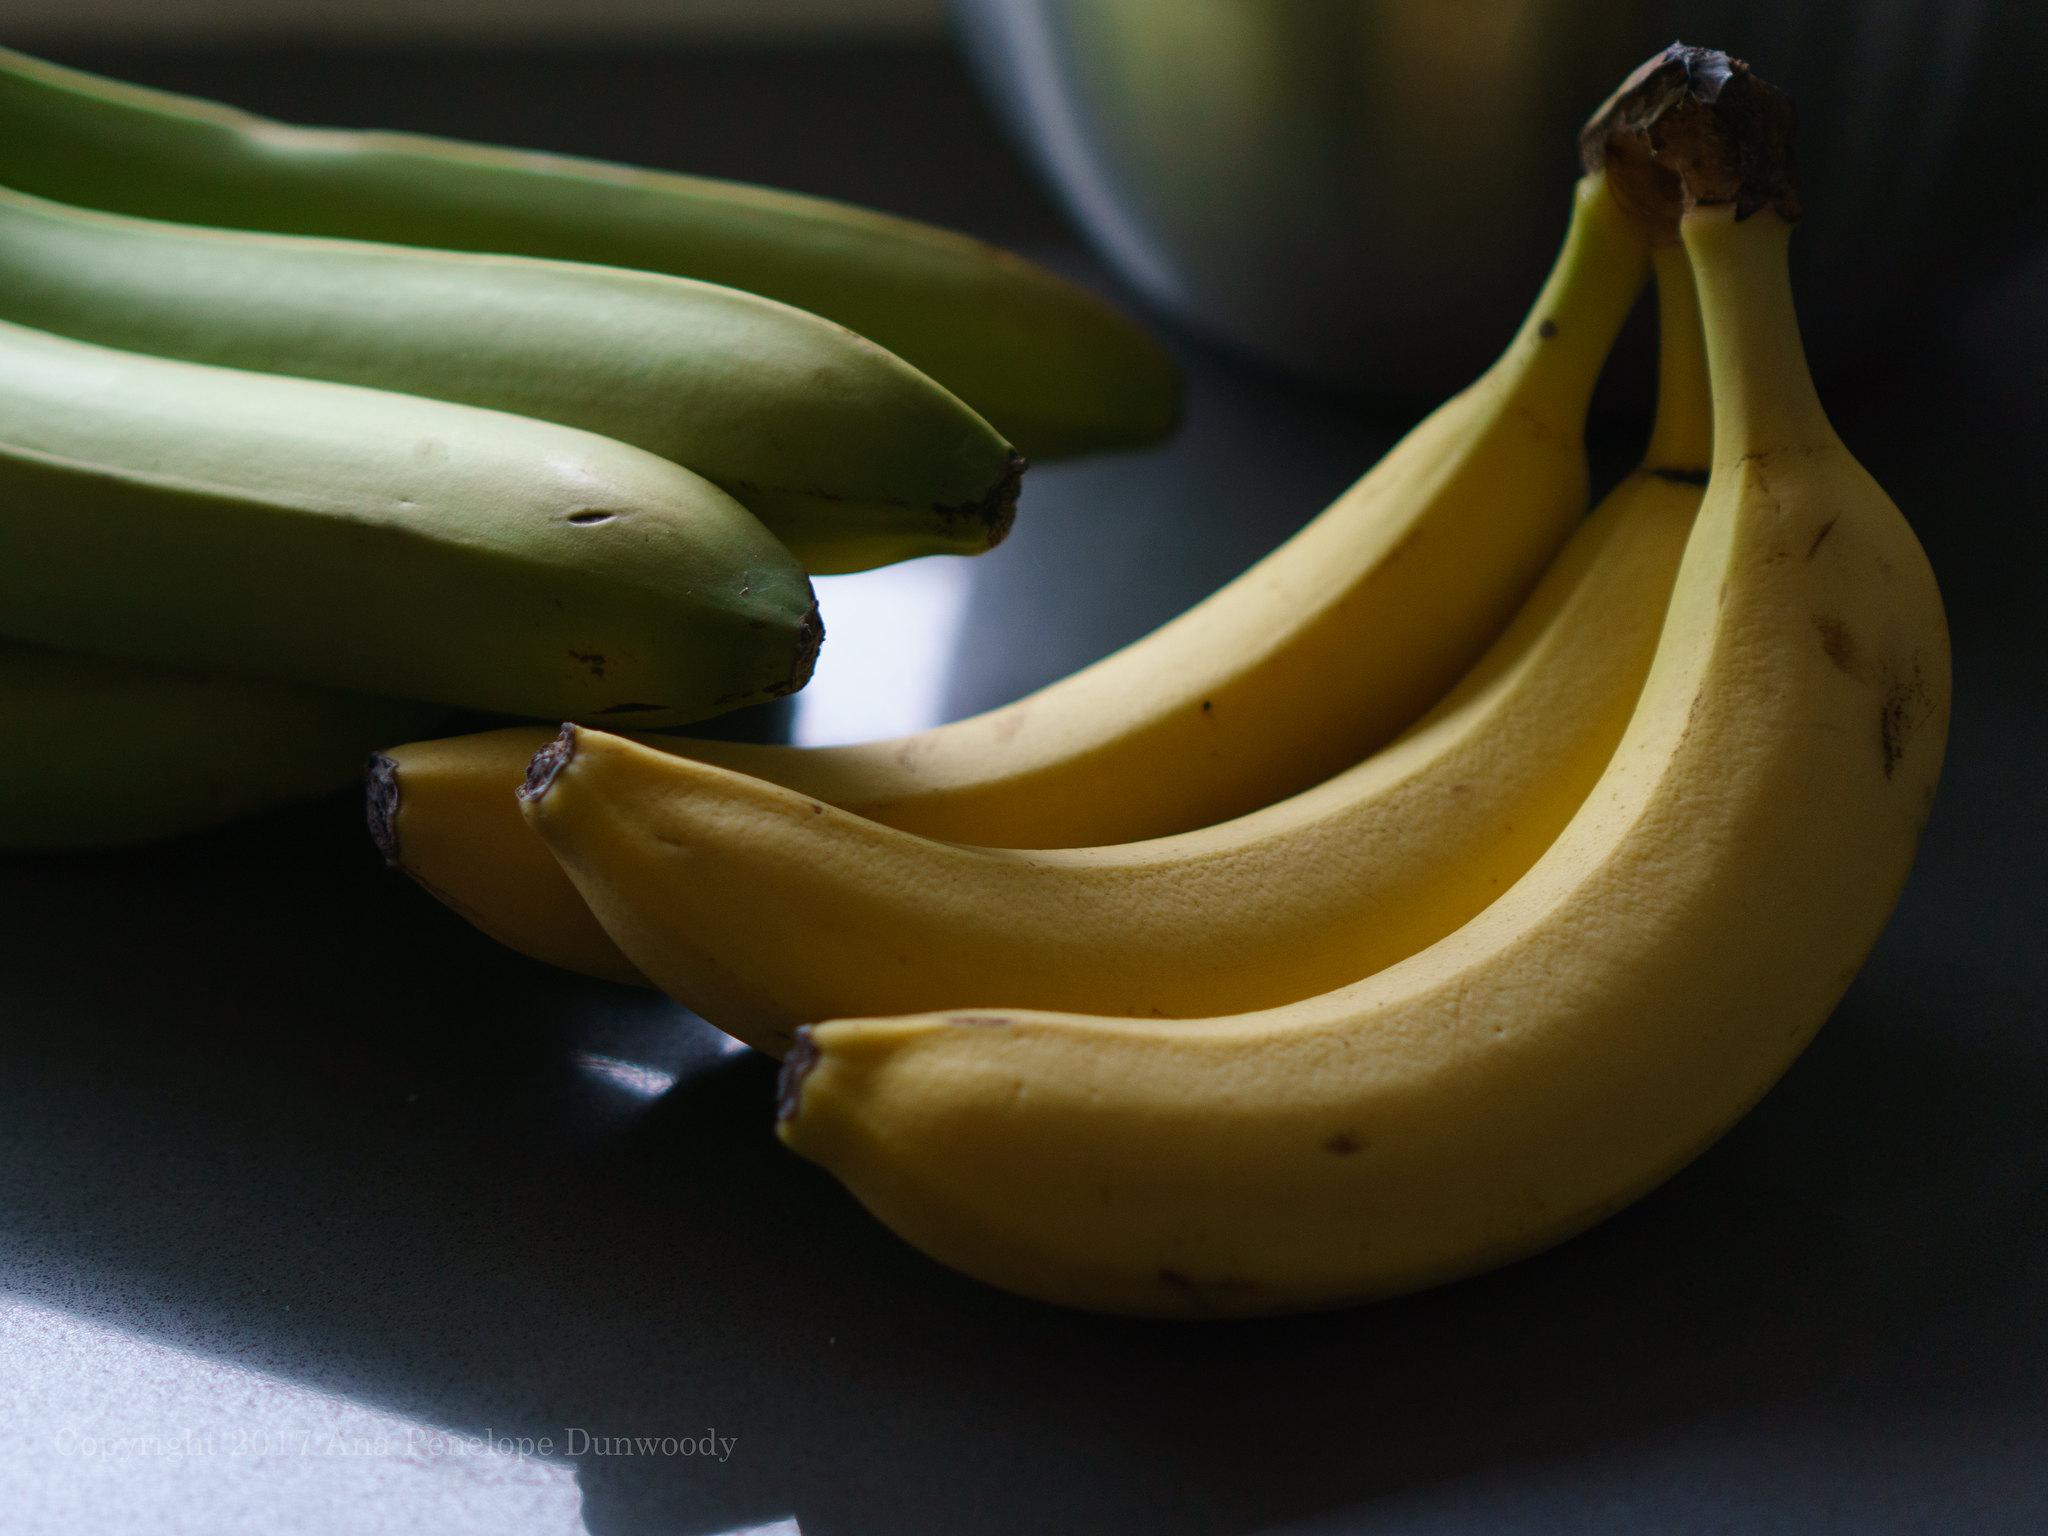 Ripe & Unripe Organic Bananas